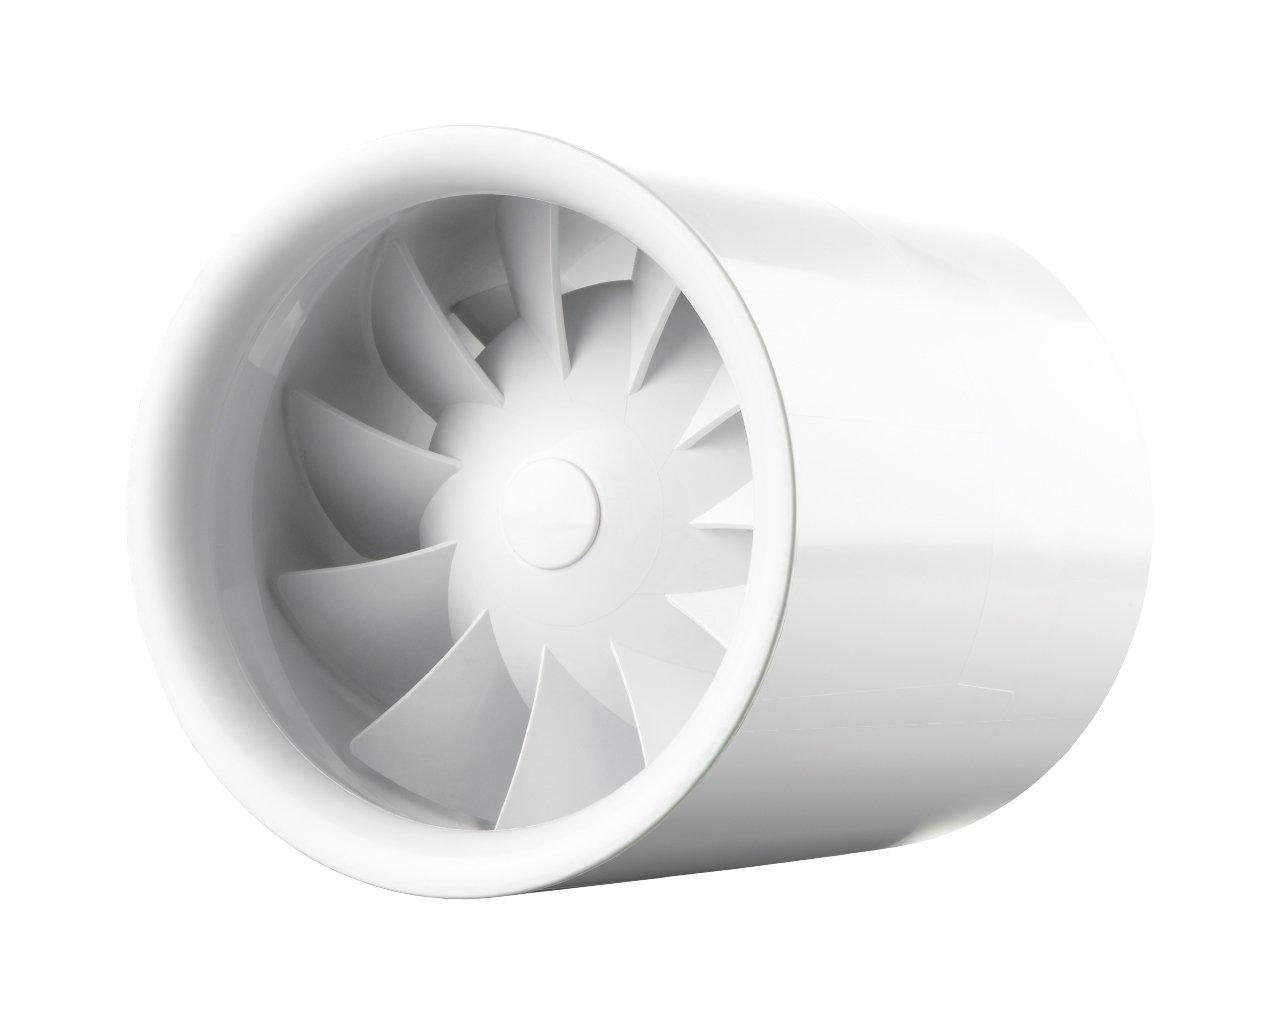 Rohreinschubventilator Soundless Turbine Duo 100mm